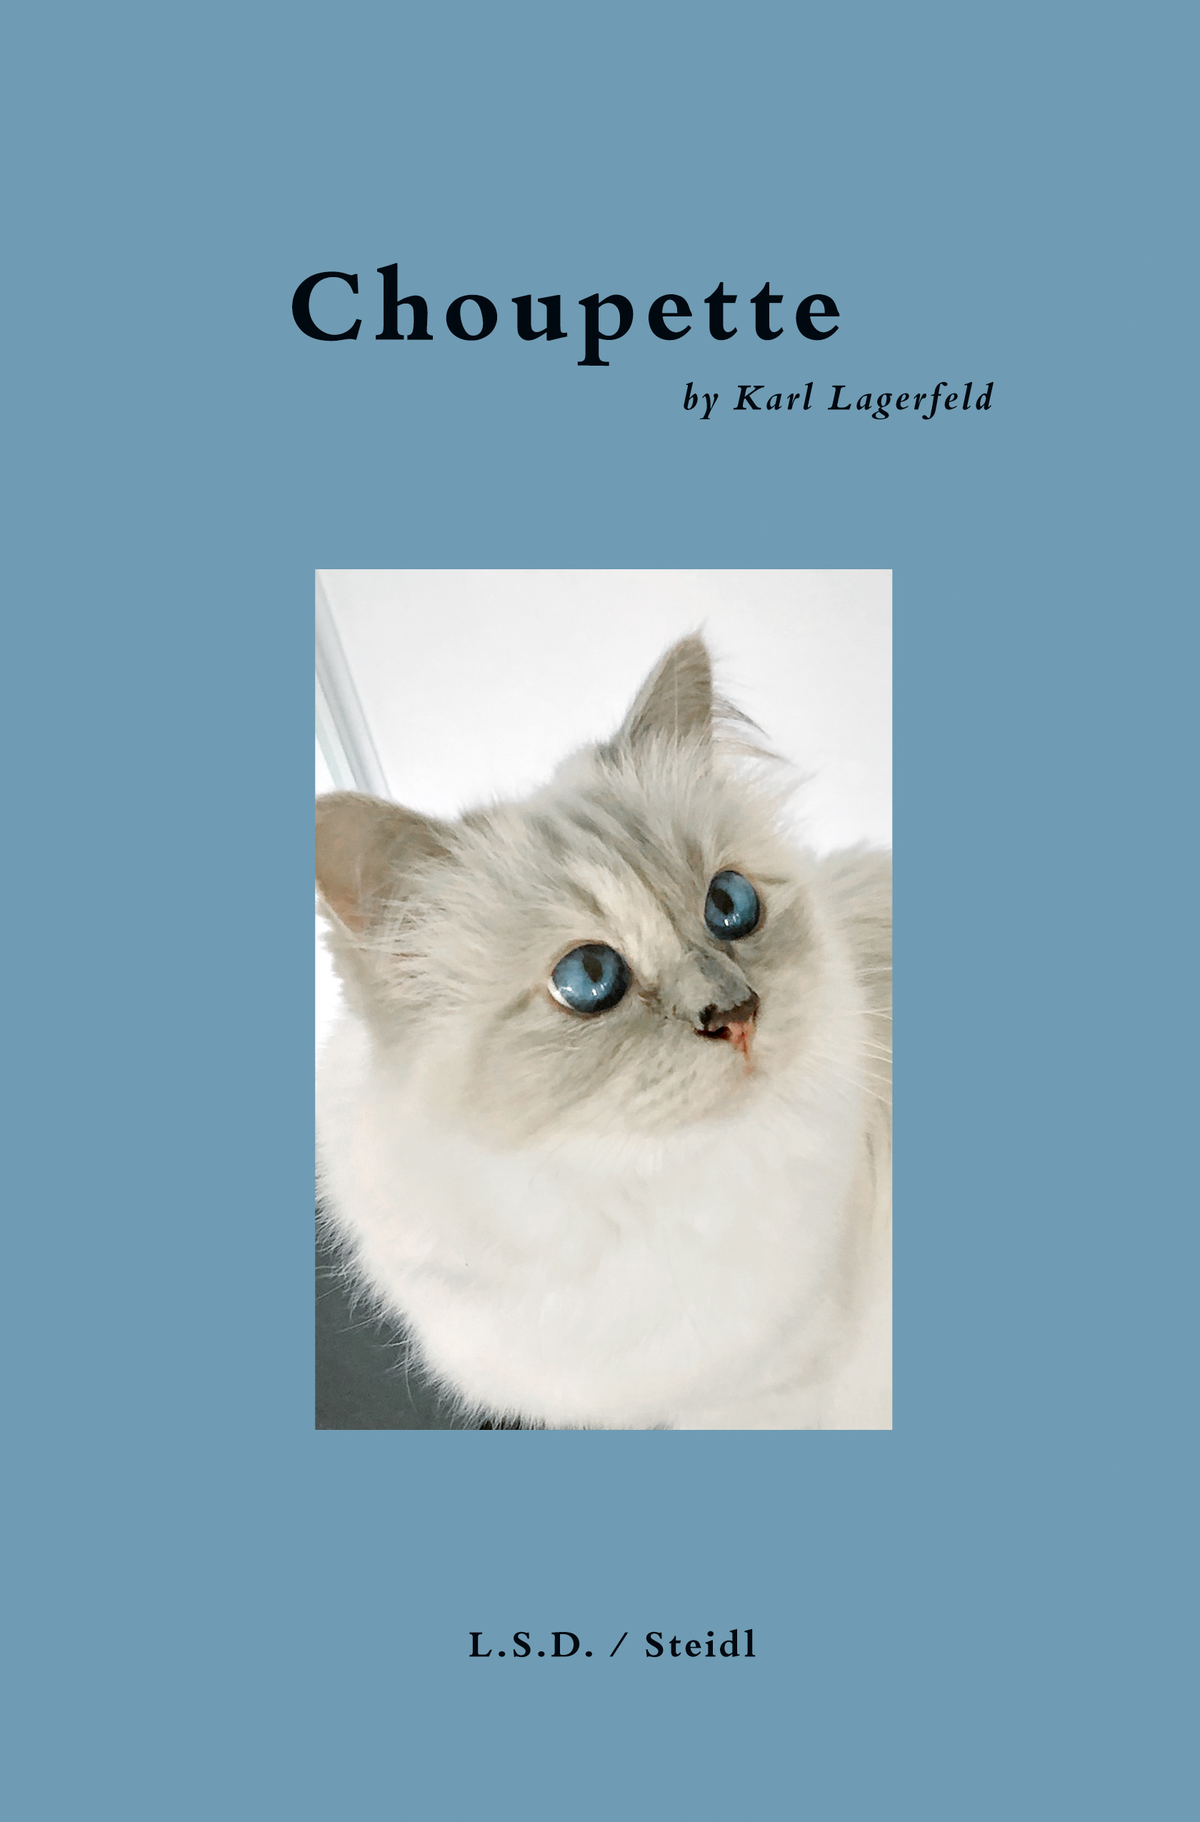 Scrapbook Of A Cat Choupette Karl Lagerfeld Steidl Verlag